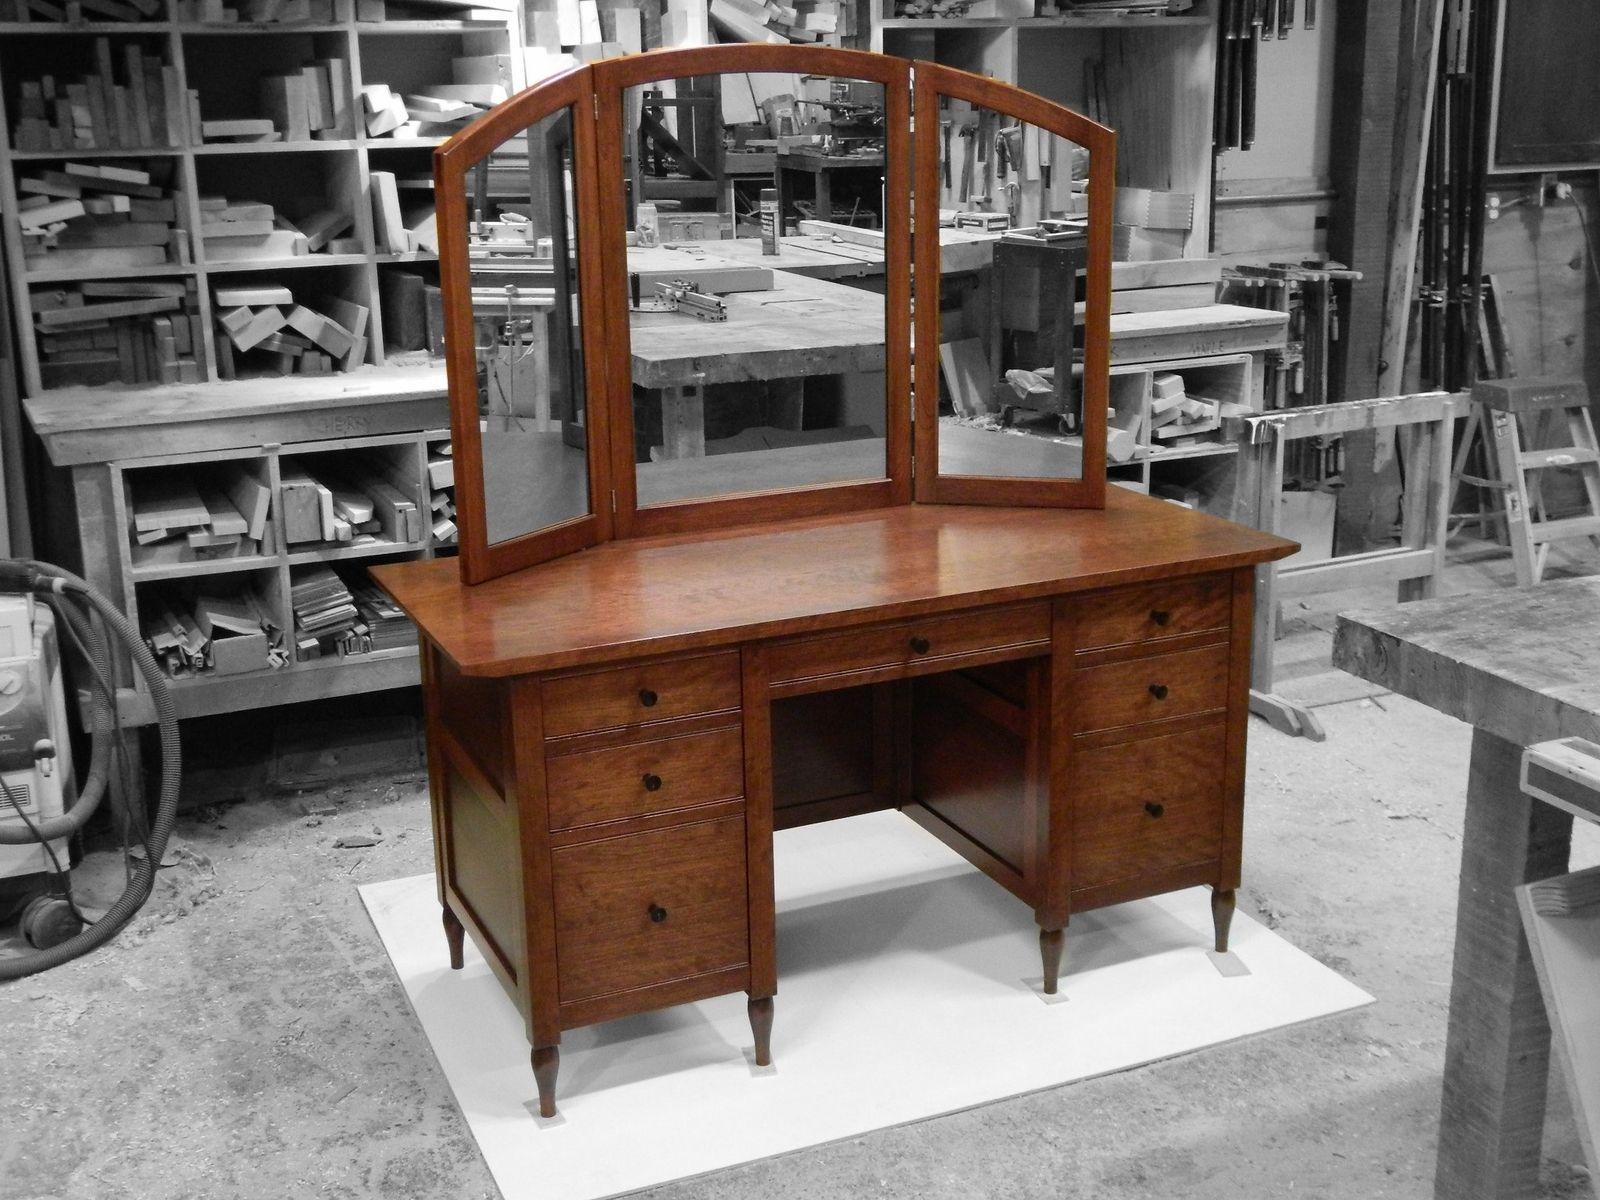 chicago antique furniture chicago antique mirror table - HD1600×1200